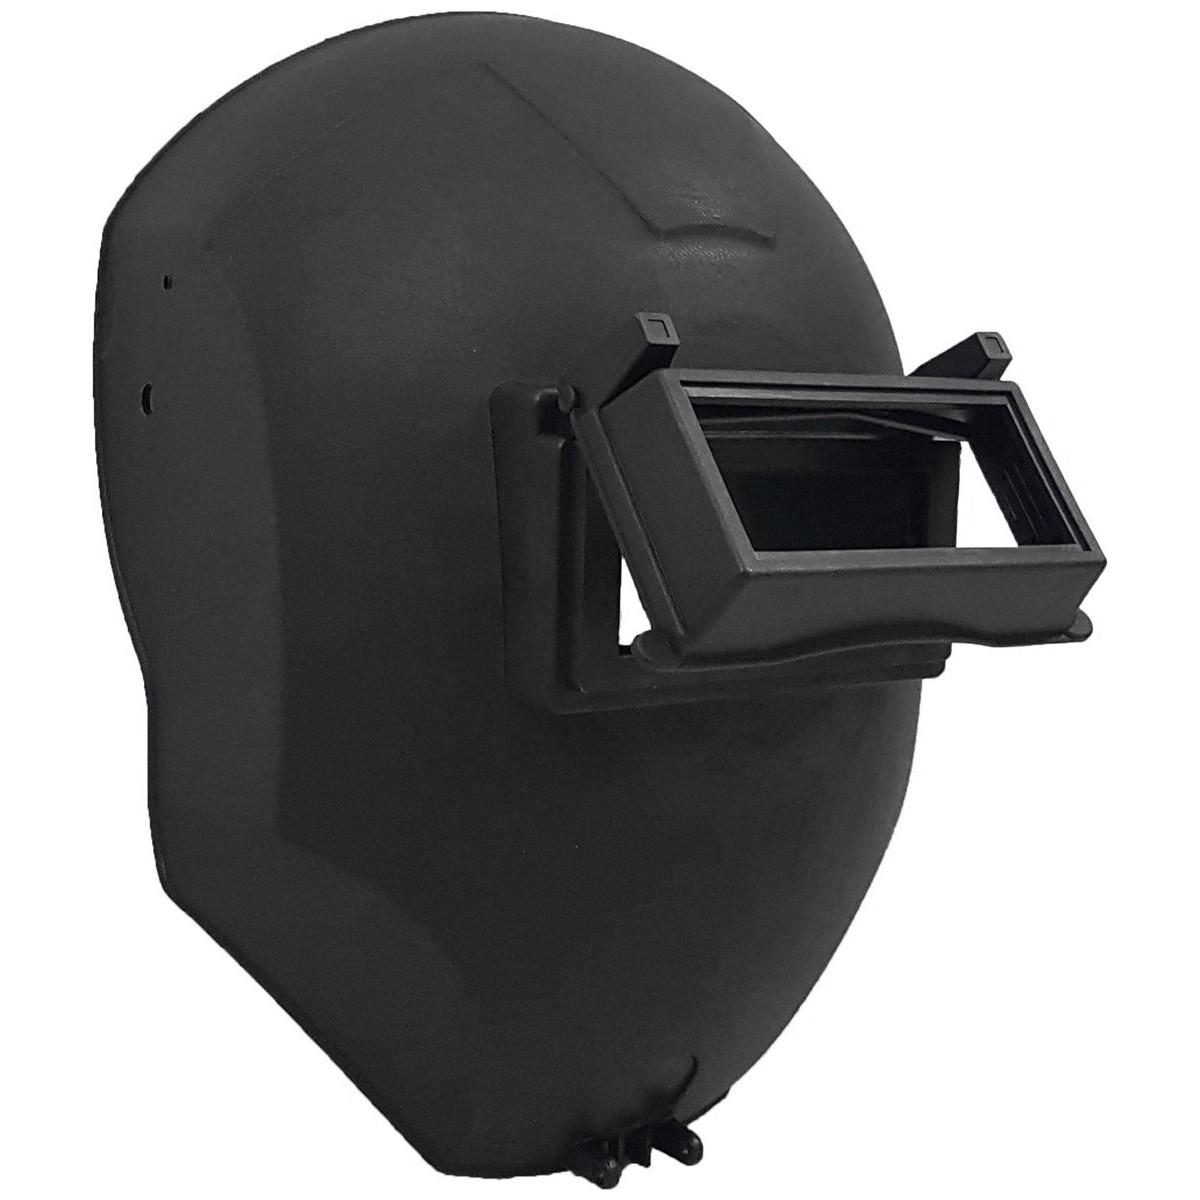 Máscara P/ Solda Plastcor Polipropileno Visor Articulado + 2 Filtros Luz + 1 Vidro Transparente